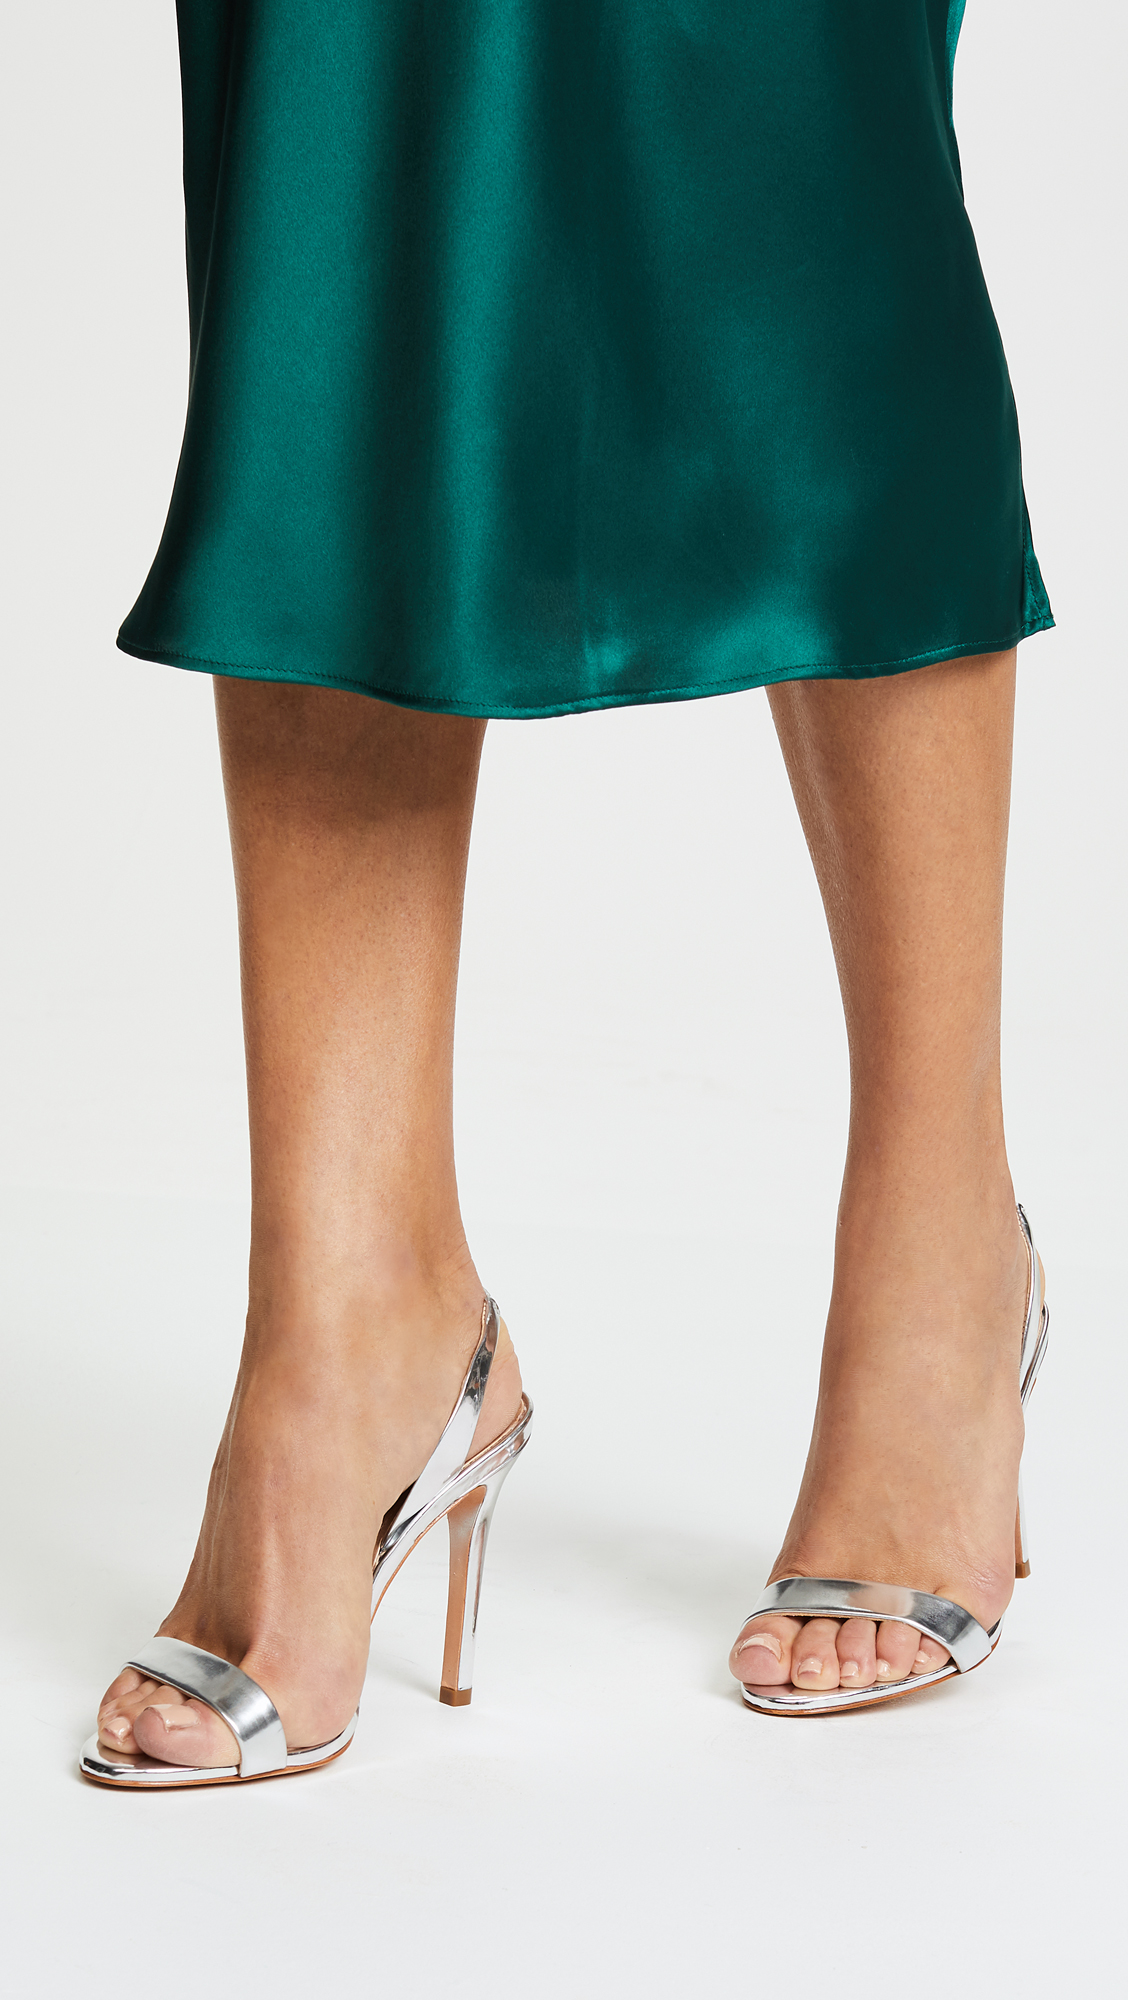 Schutz Luriane Heel